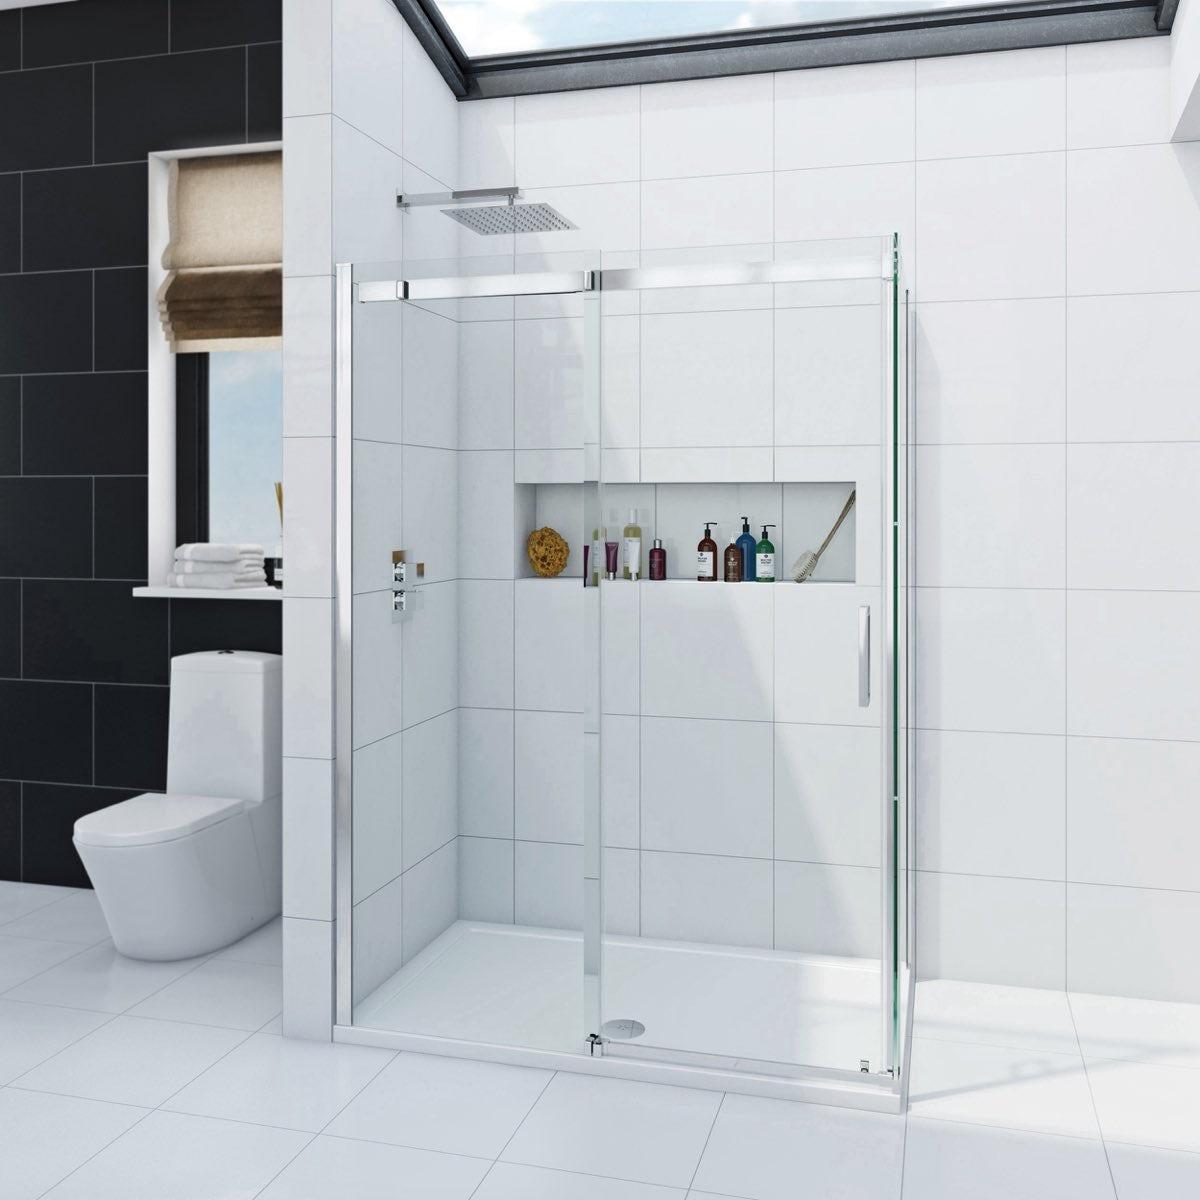 Mode Infiniti 8mm Rectangular Shower Enclosure